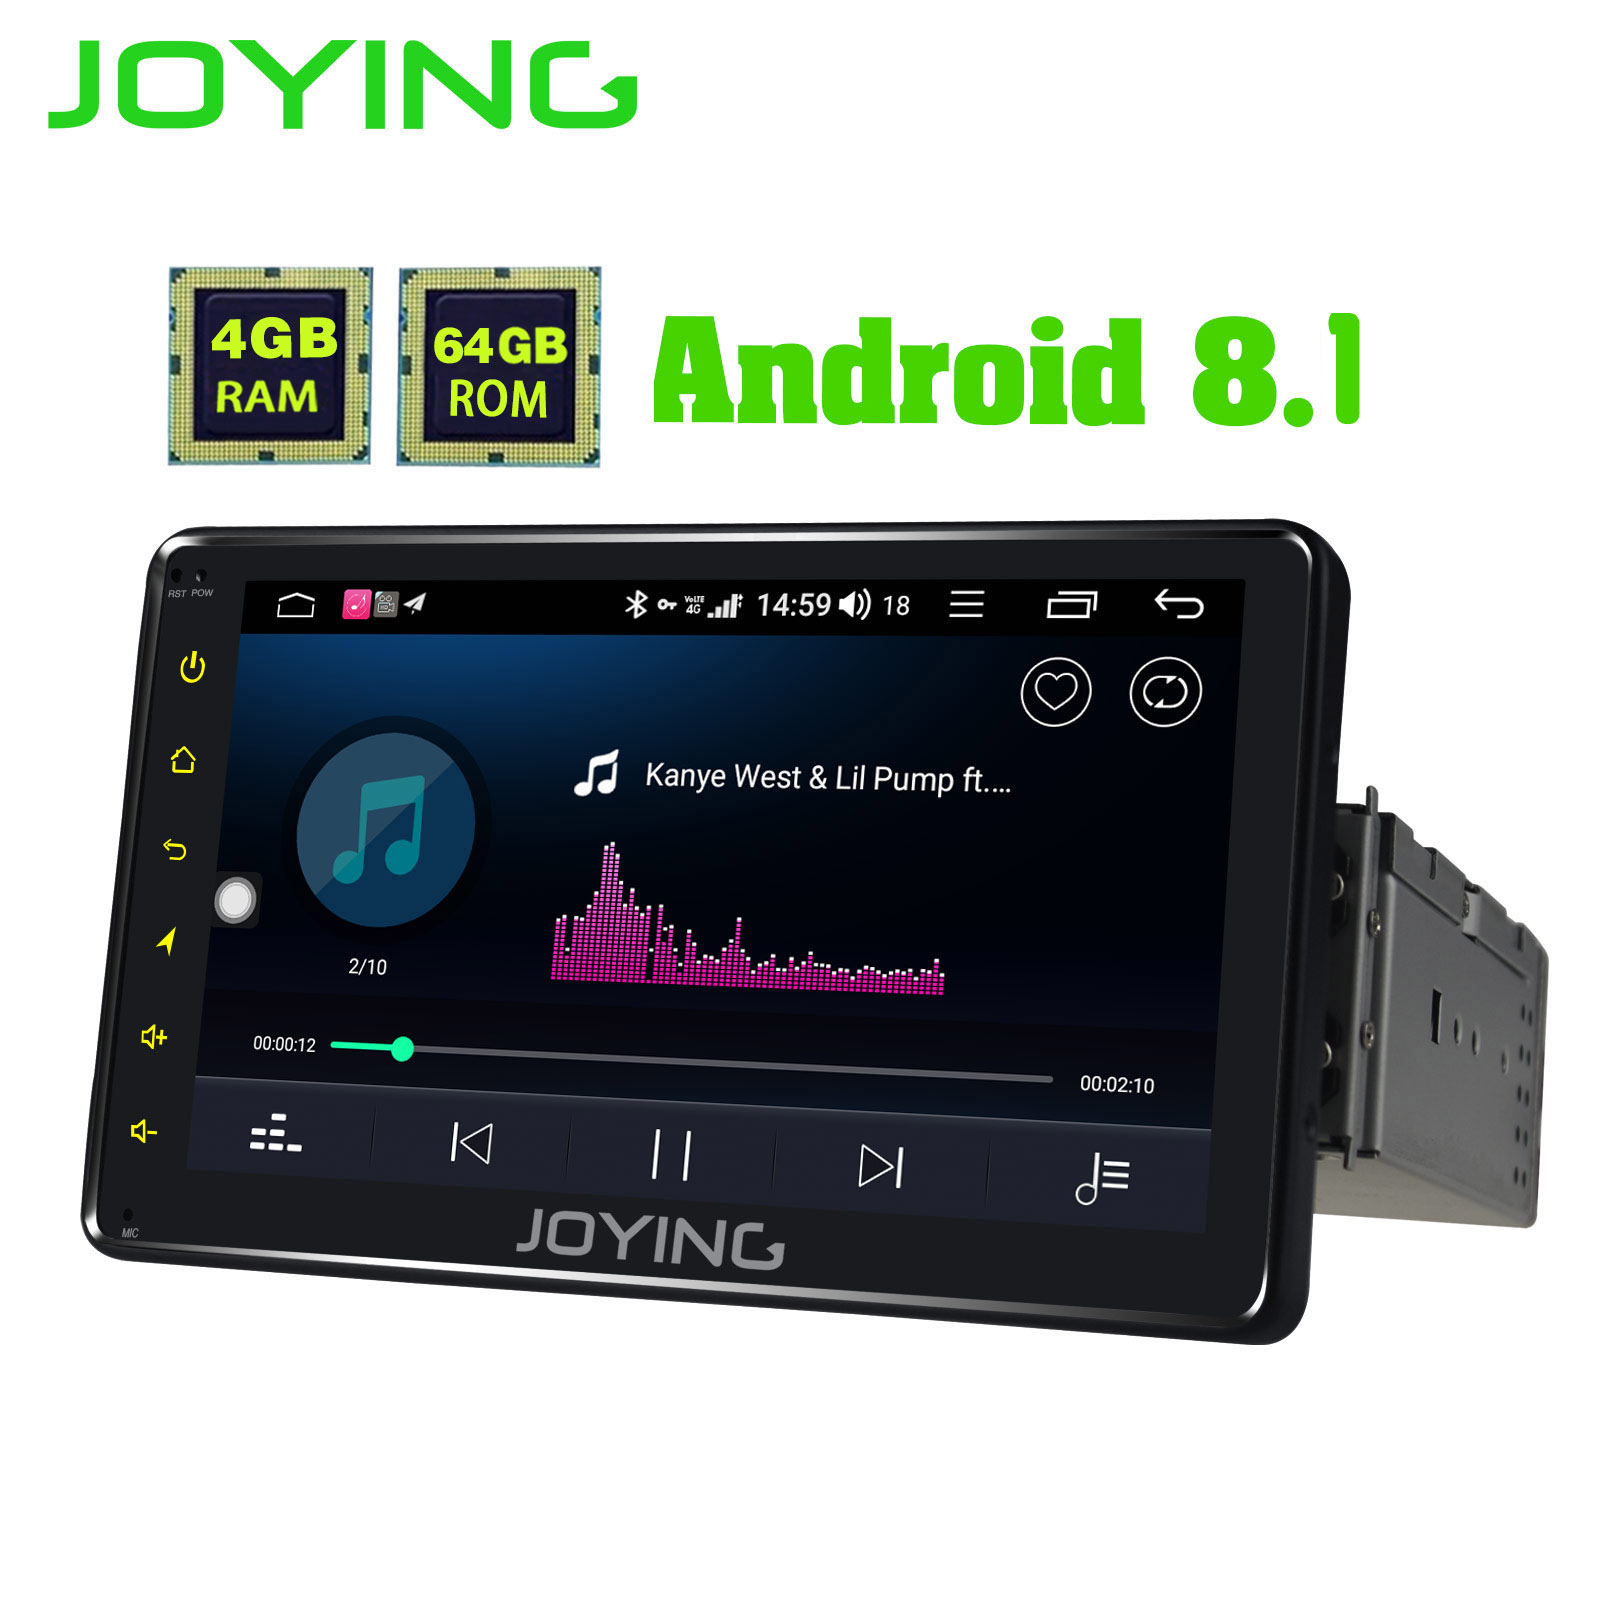 JOYING Navi Autoradio Display 1-Din android Carplay/swc Stereo-Support Octa-Core 4G GPS